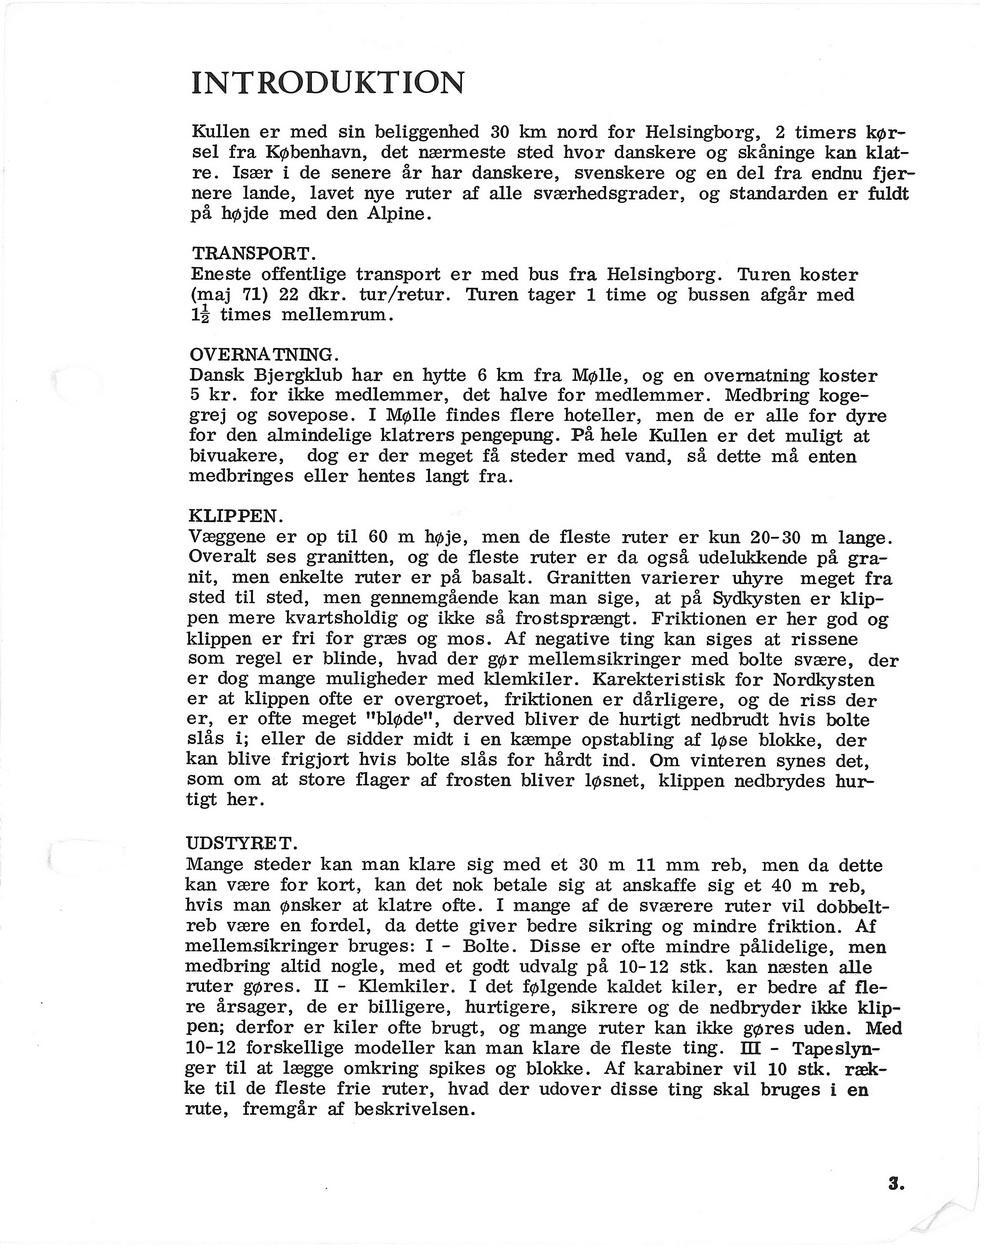 Kullen guide 1972 003.jpg